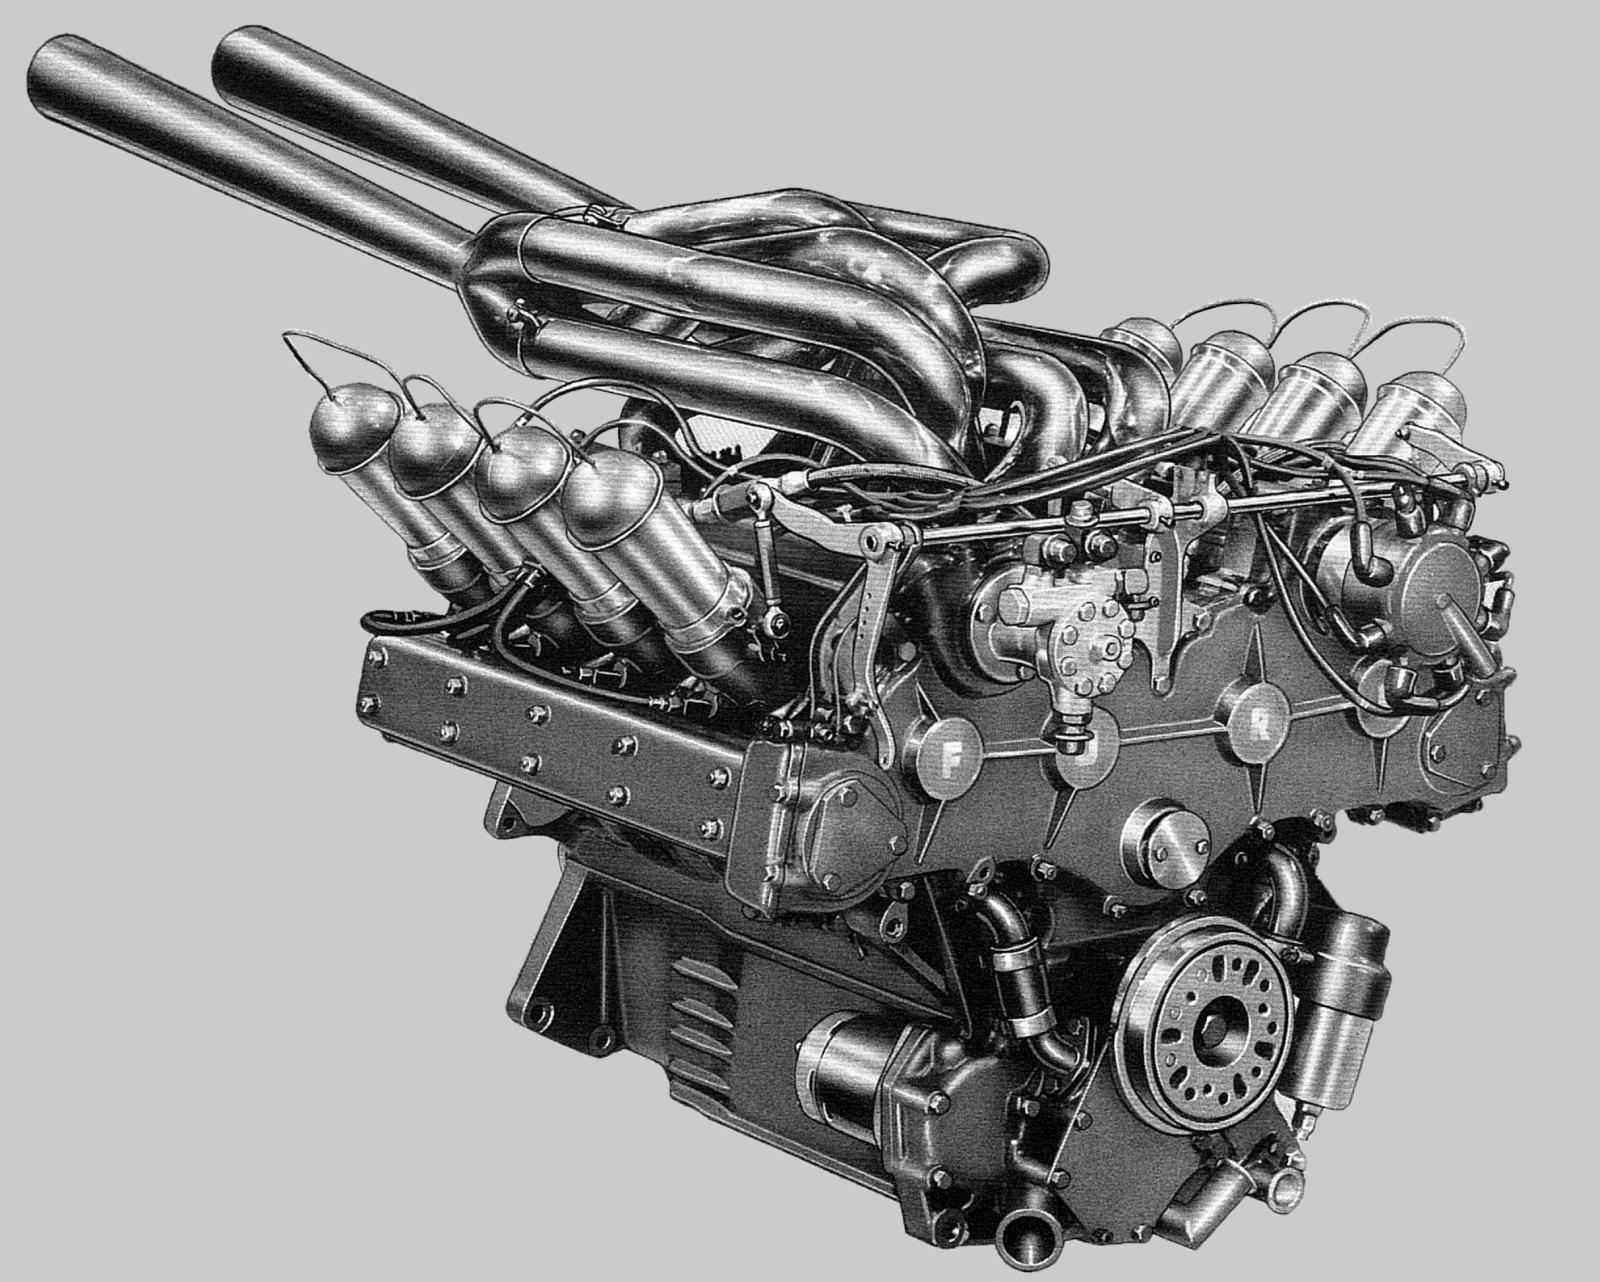 289 ci V8 Ford